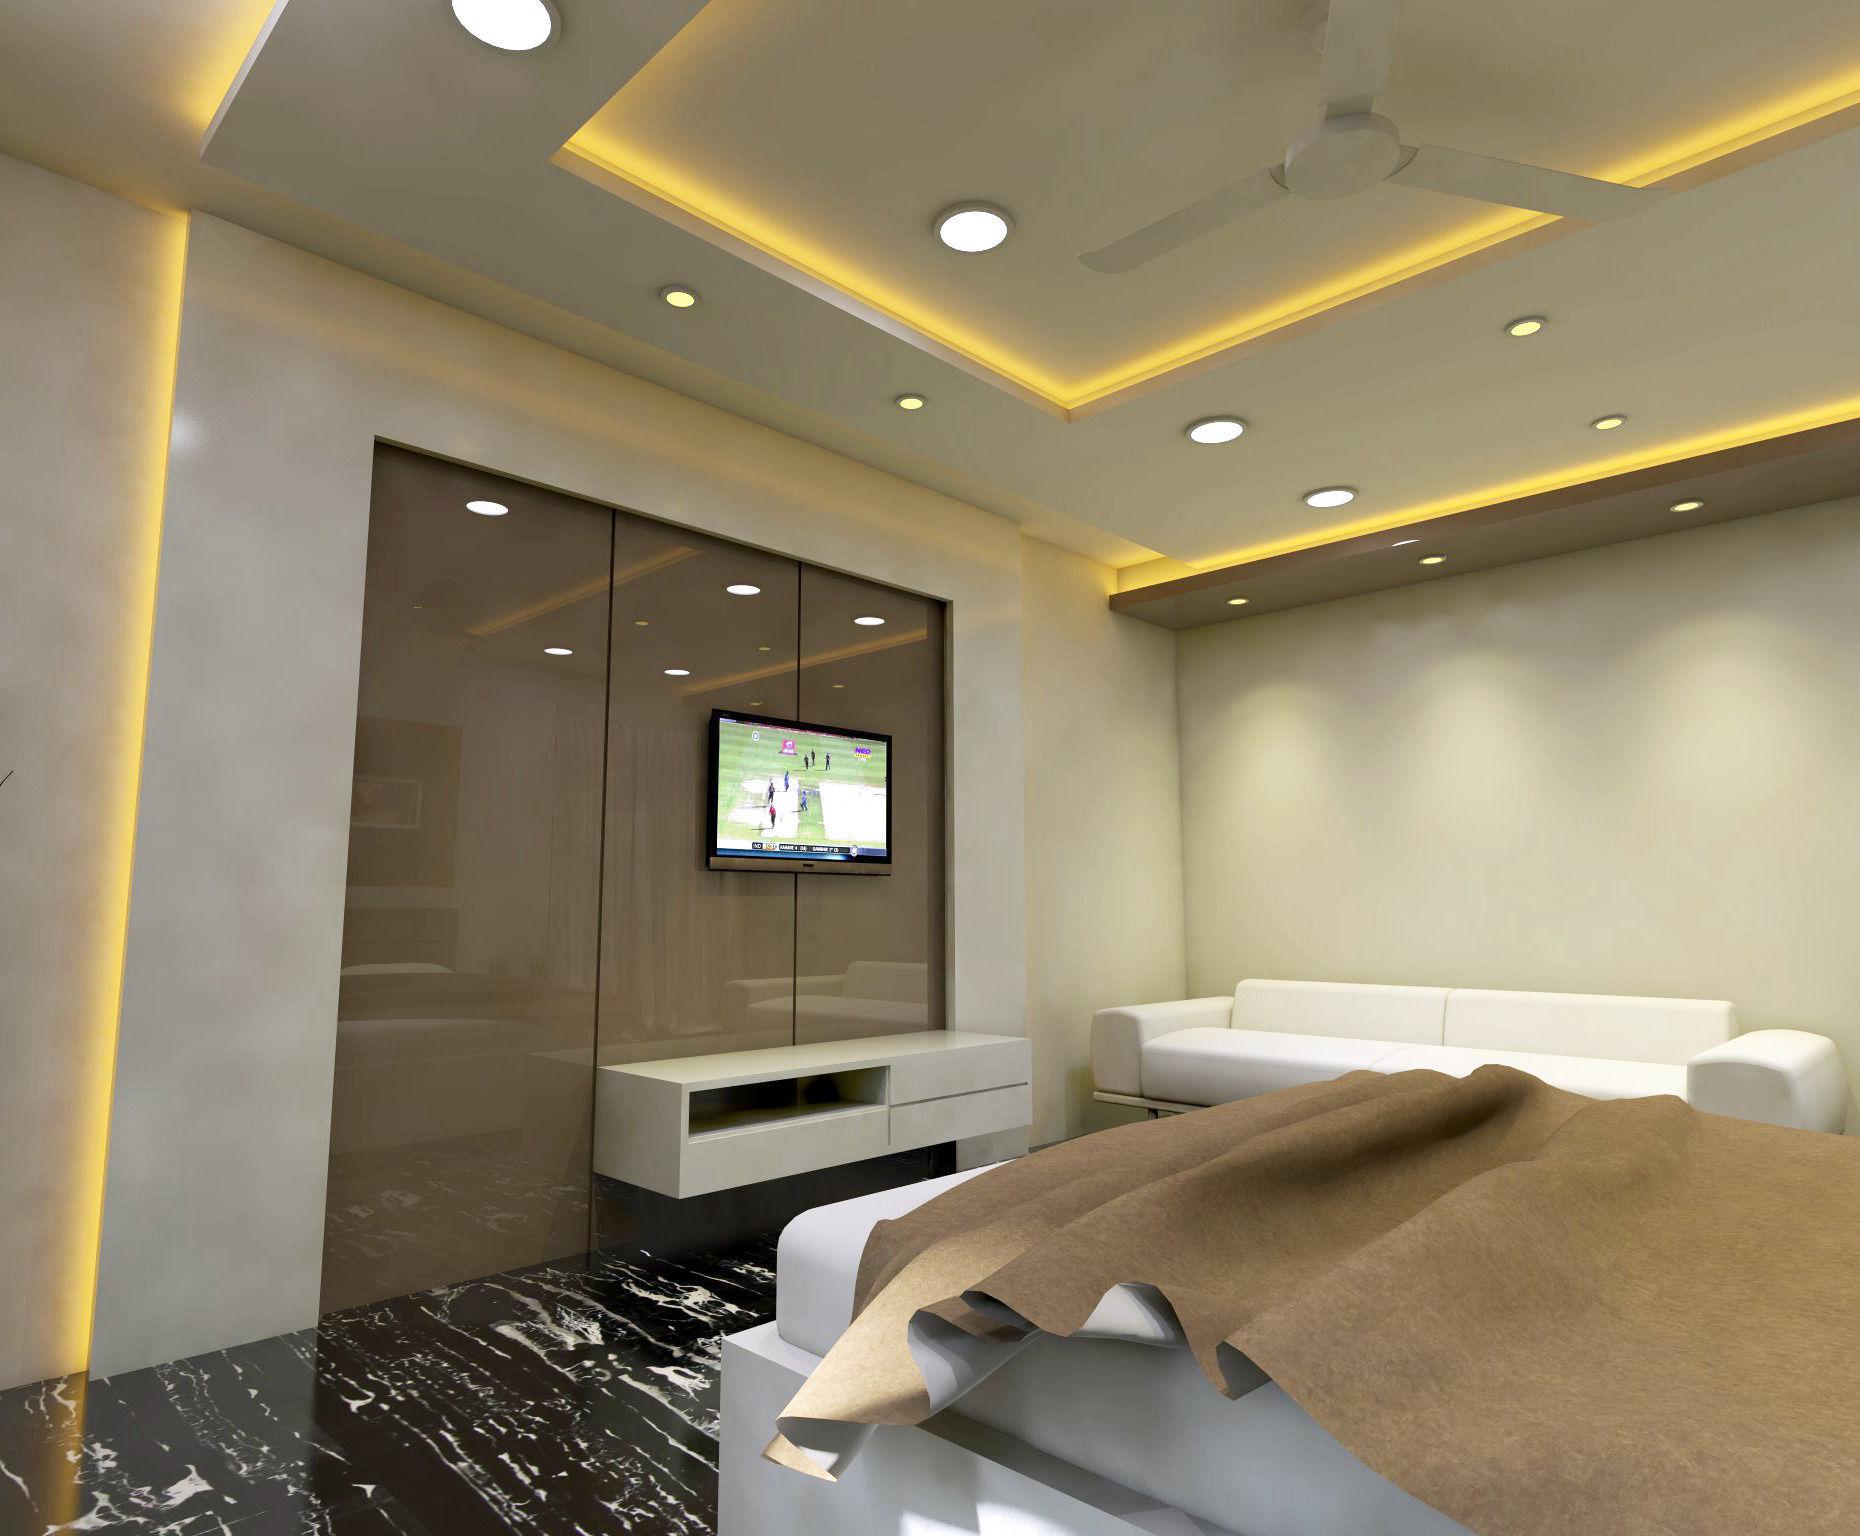 modern bedroom interior vray rendered 3d